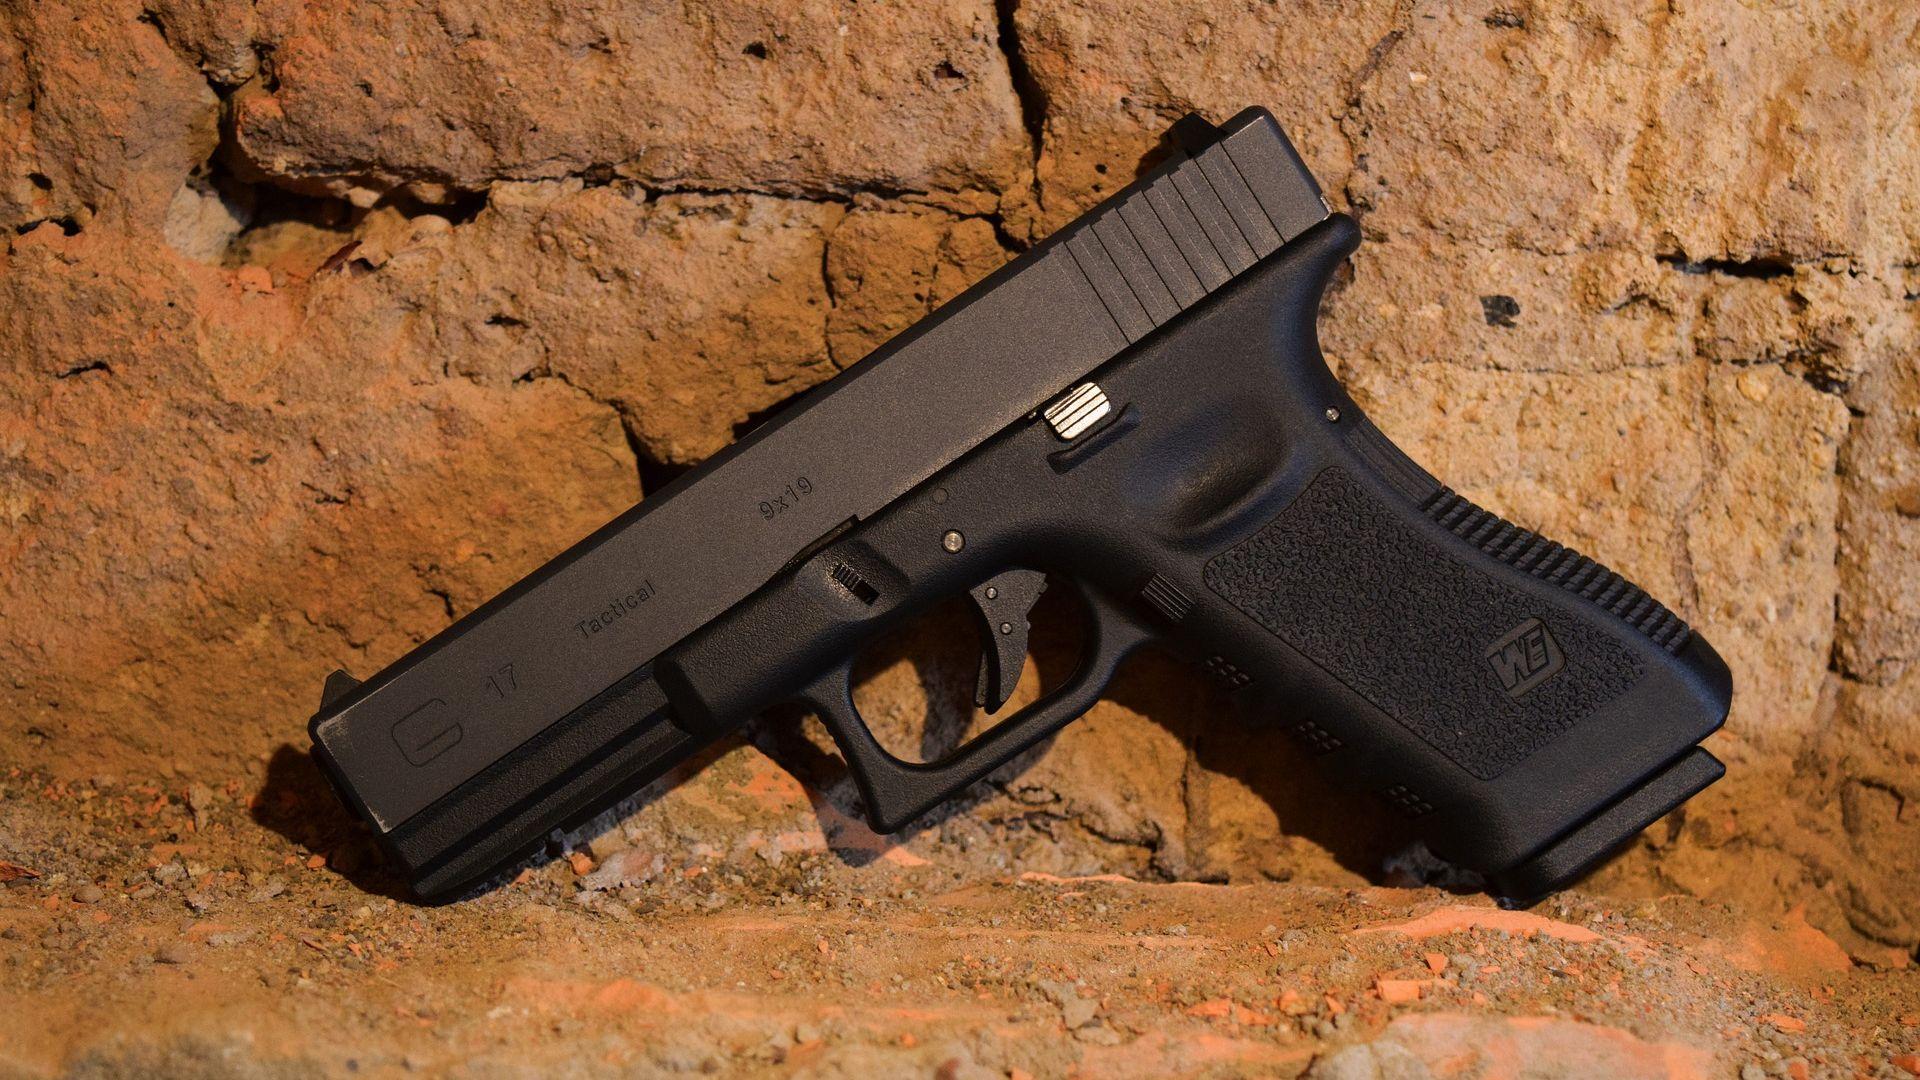 Wallpaper WE Airsoft Glock 19 Gun, weapons, close up